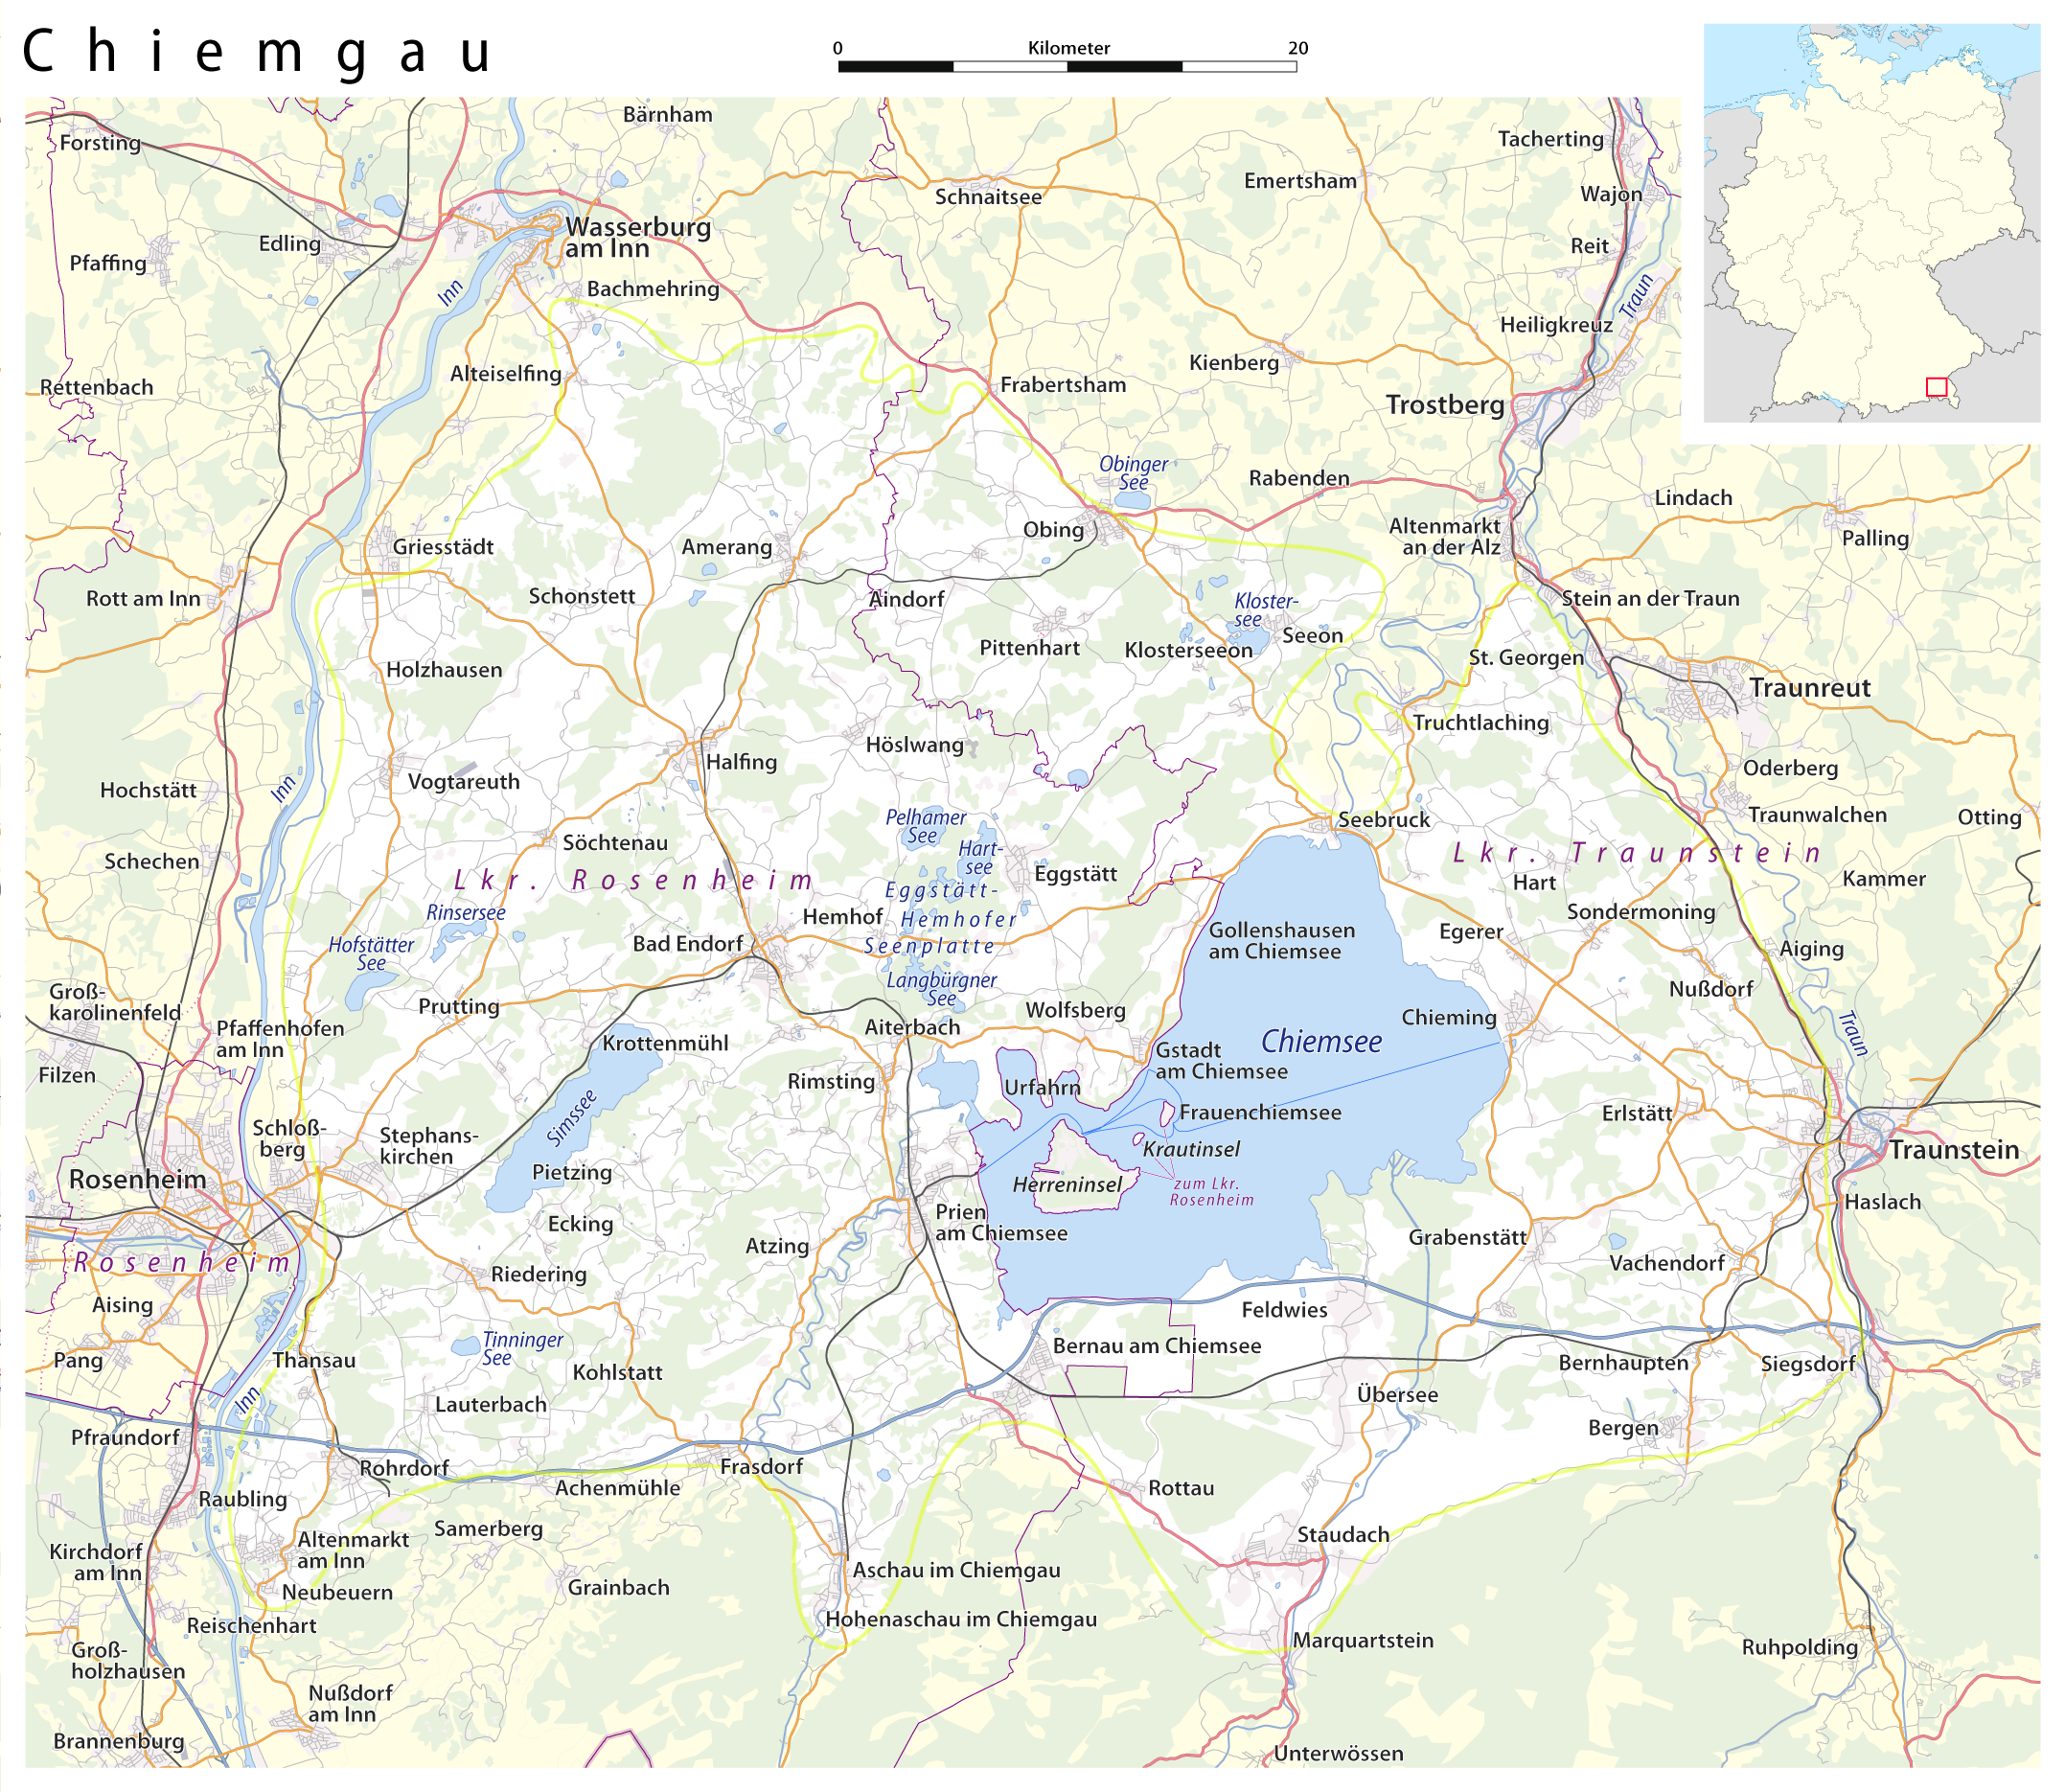 Chiemsee Karte Pdf.Chiemgau Wikipedia